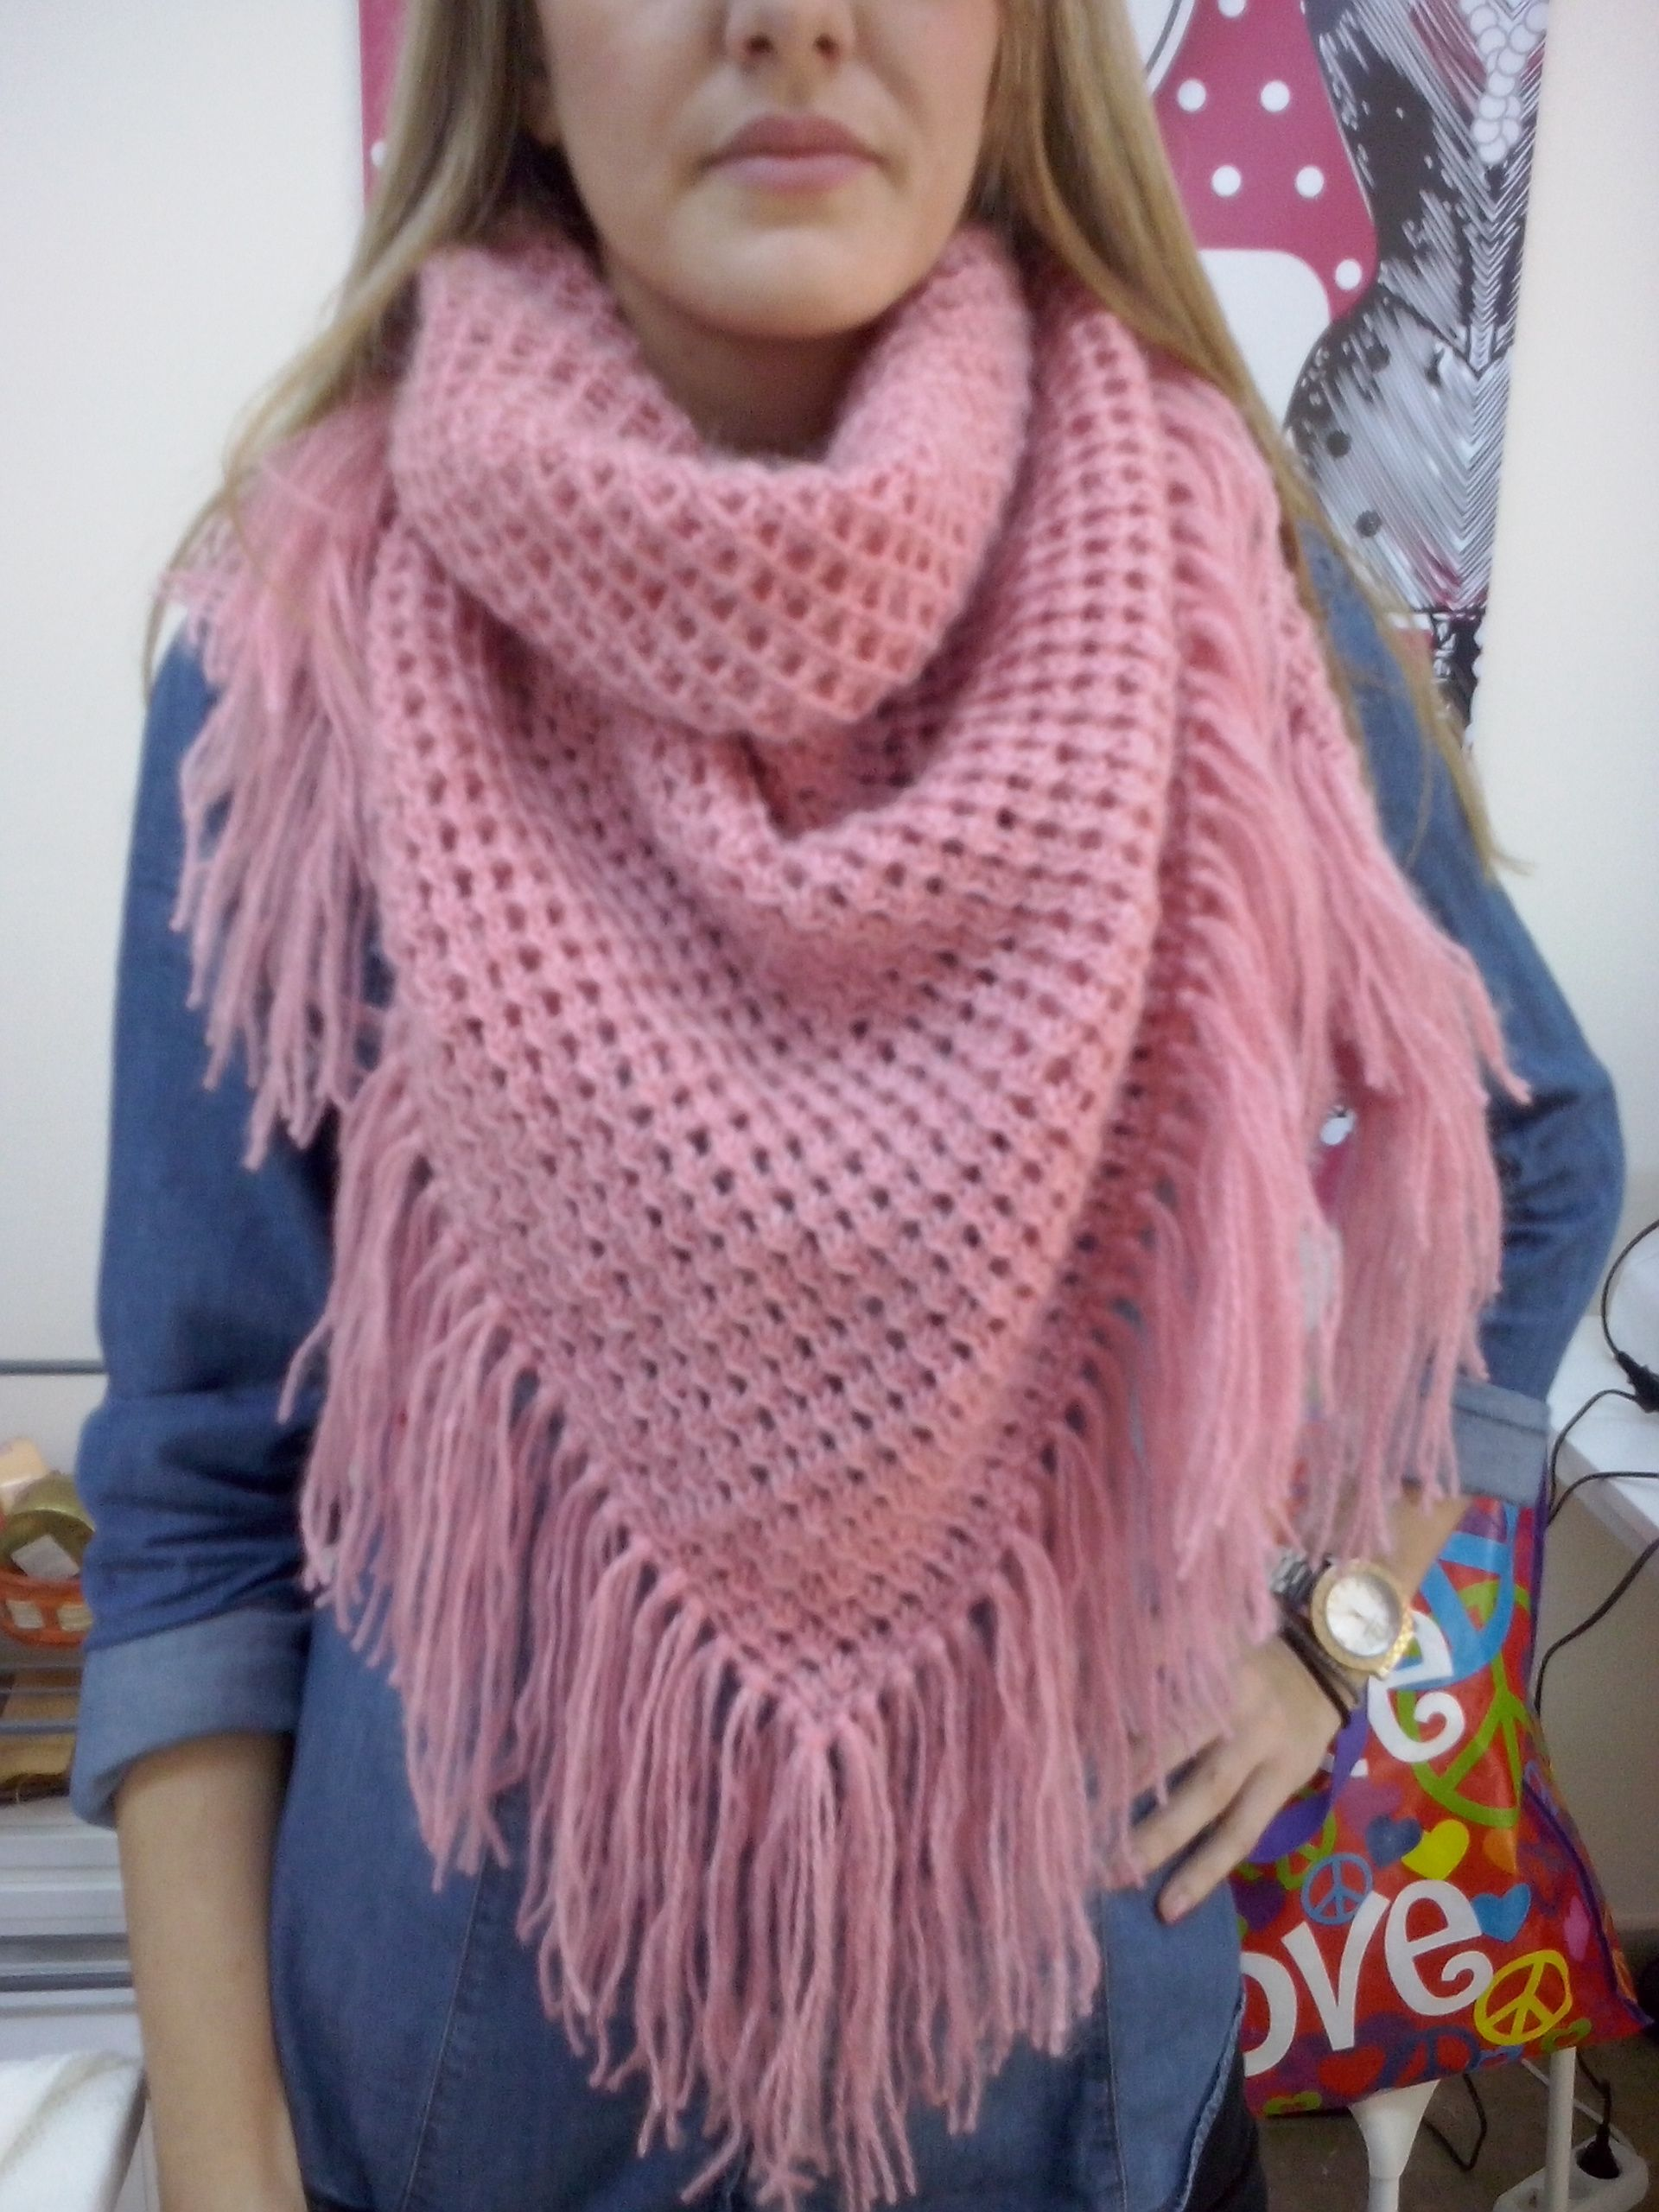 5c46929daa1a Τριγωνικό σάλι σε απαλό ροζ μοχέρ νήμα που φοριέται σαν κασκόλ.Πλέξιμο με  Νελόνες Γ΄Κύκλος